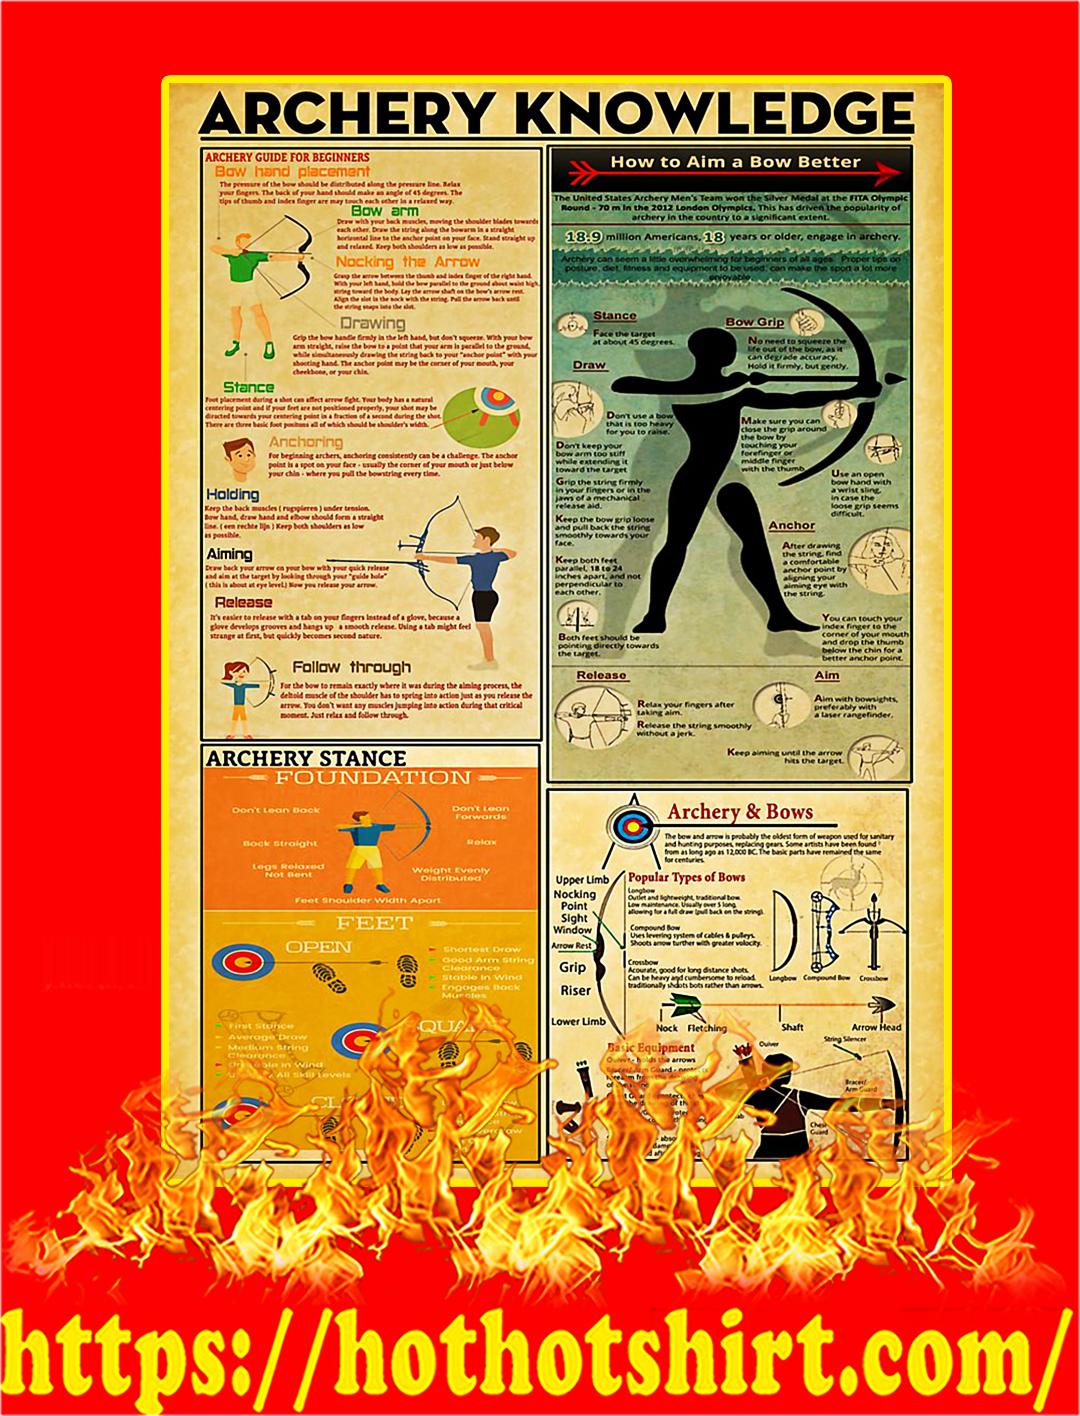 Archery Knowledge Poster